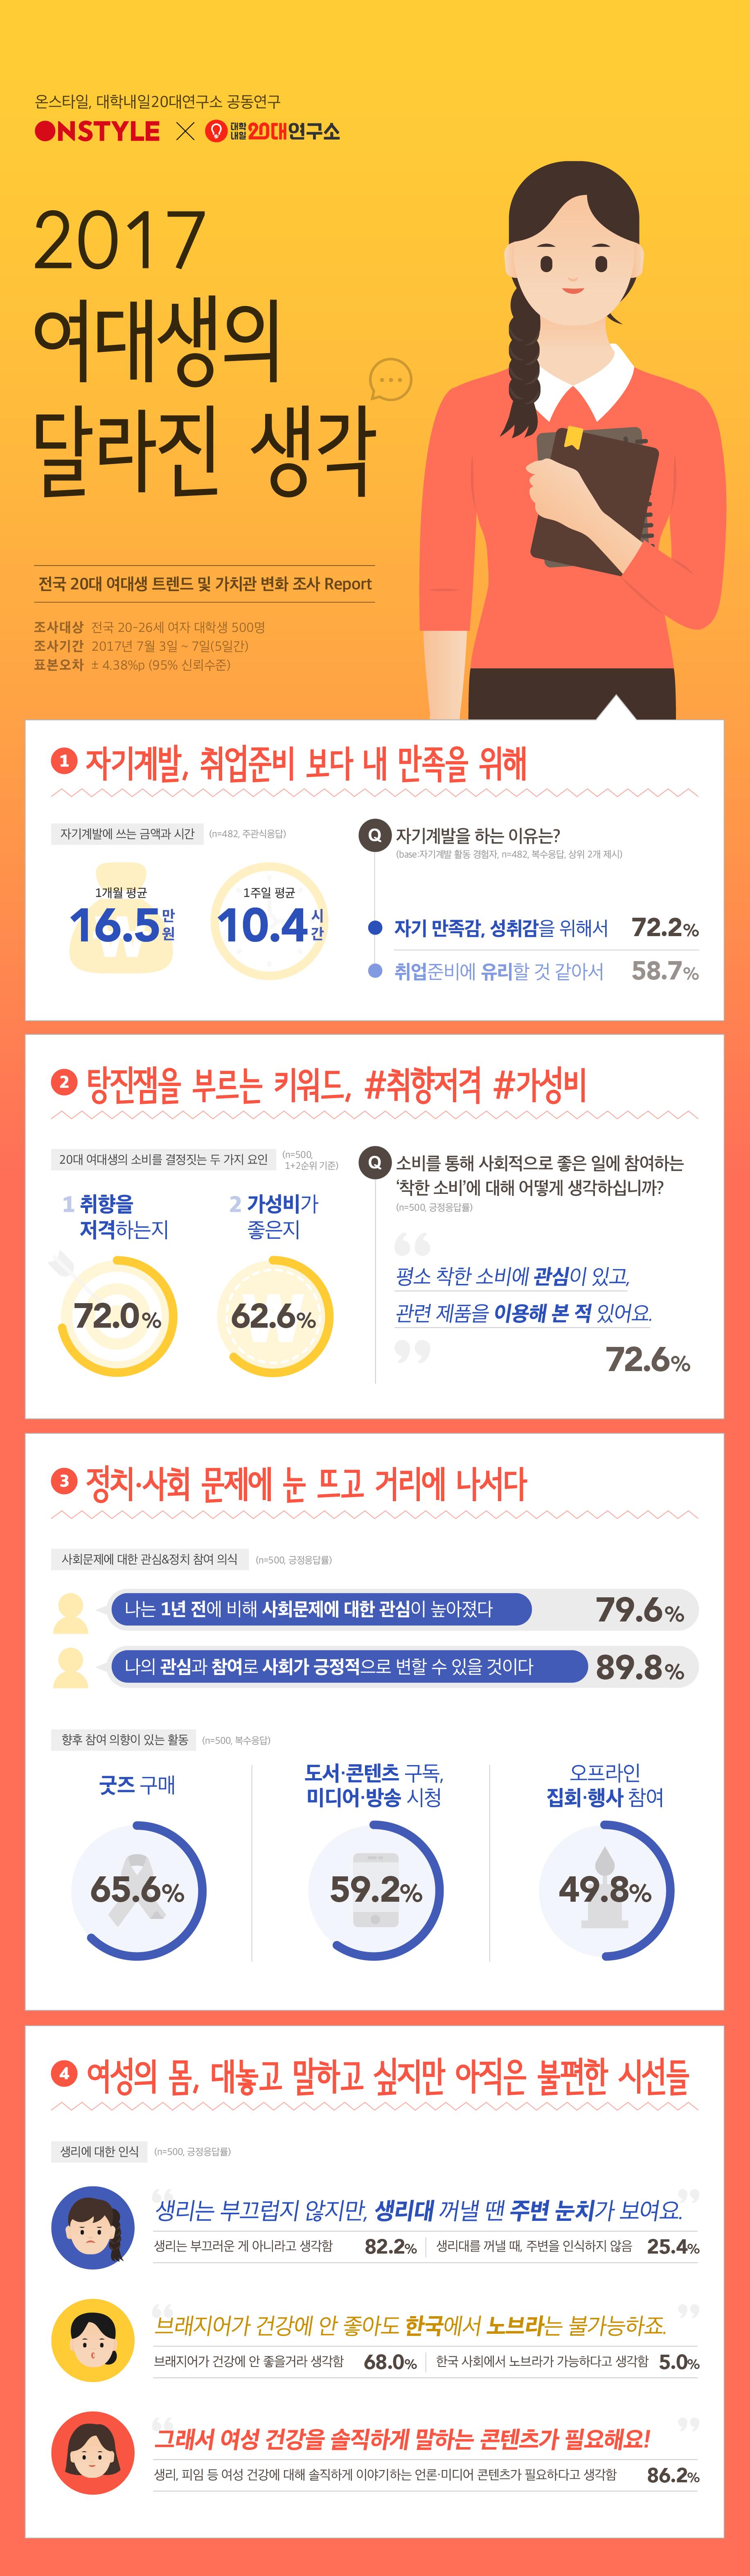 2017_%ec%97%ac%eb%8c%80%ec%83%9d%ec%9d%98%eb%8b%ac%eb%9d%bc%ec%a7%84%ec%83%9d%ea%b0%81-1